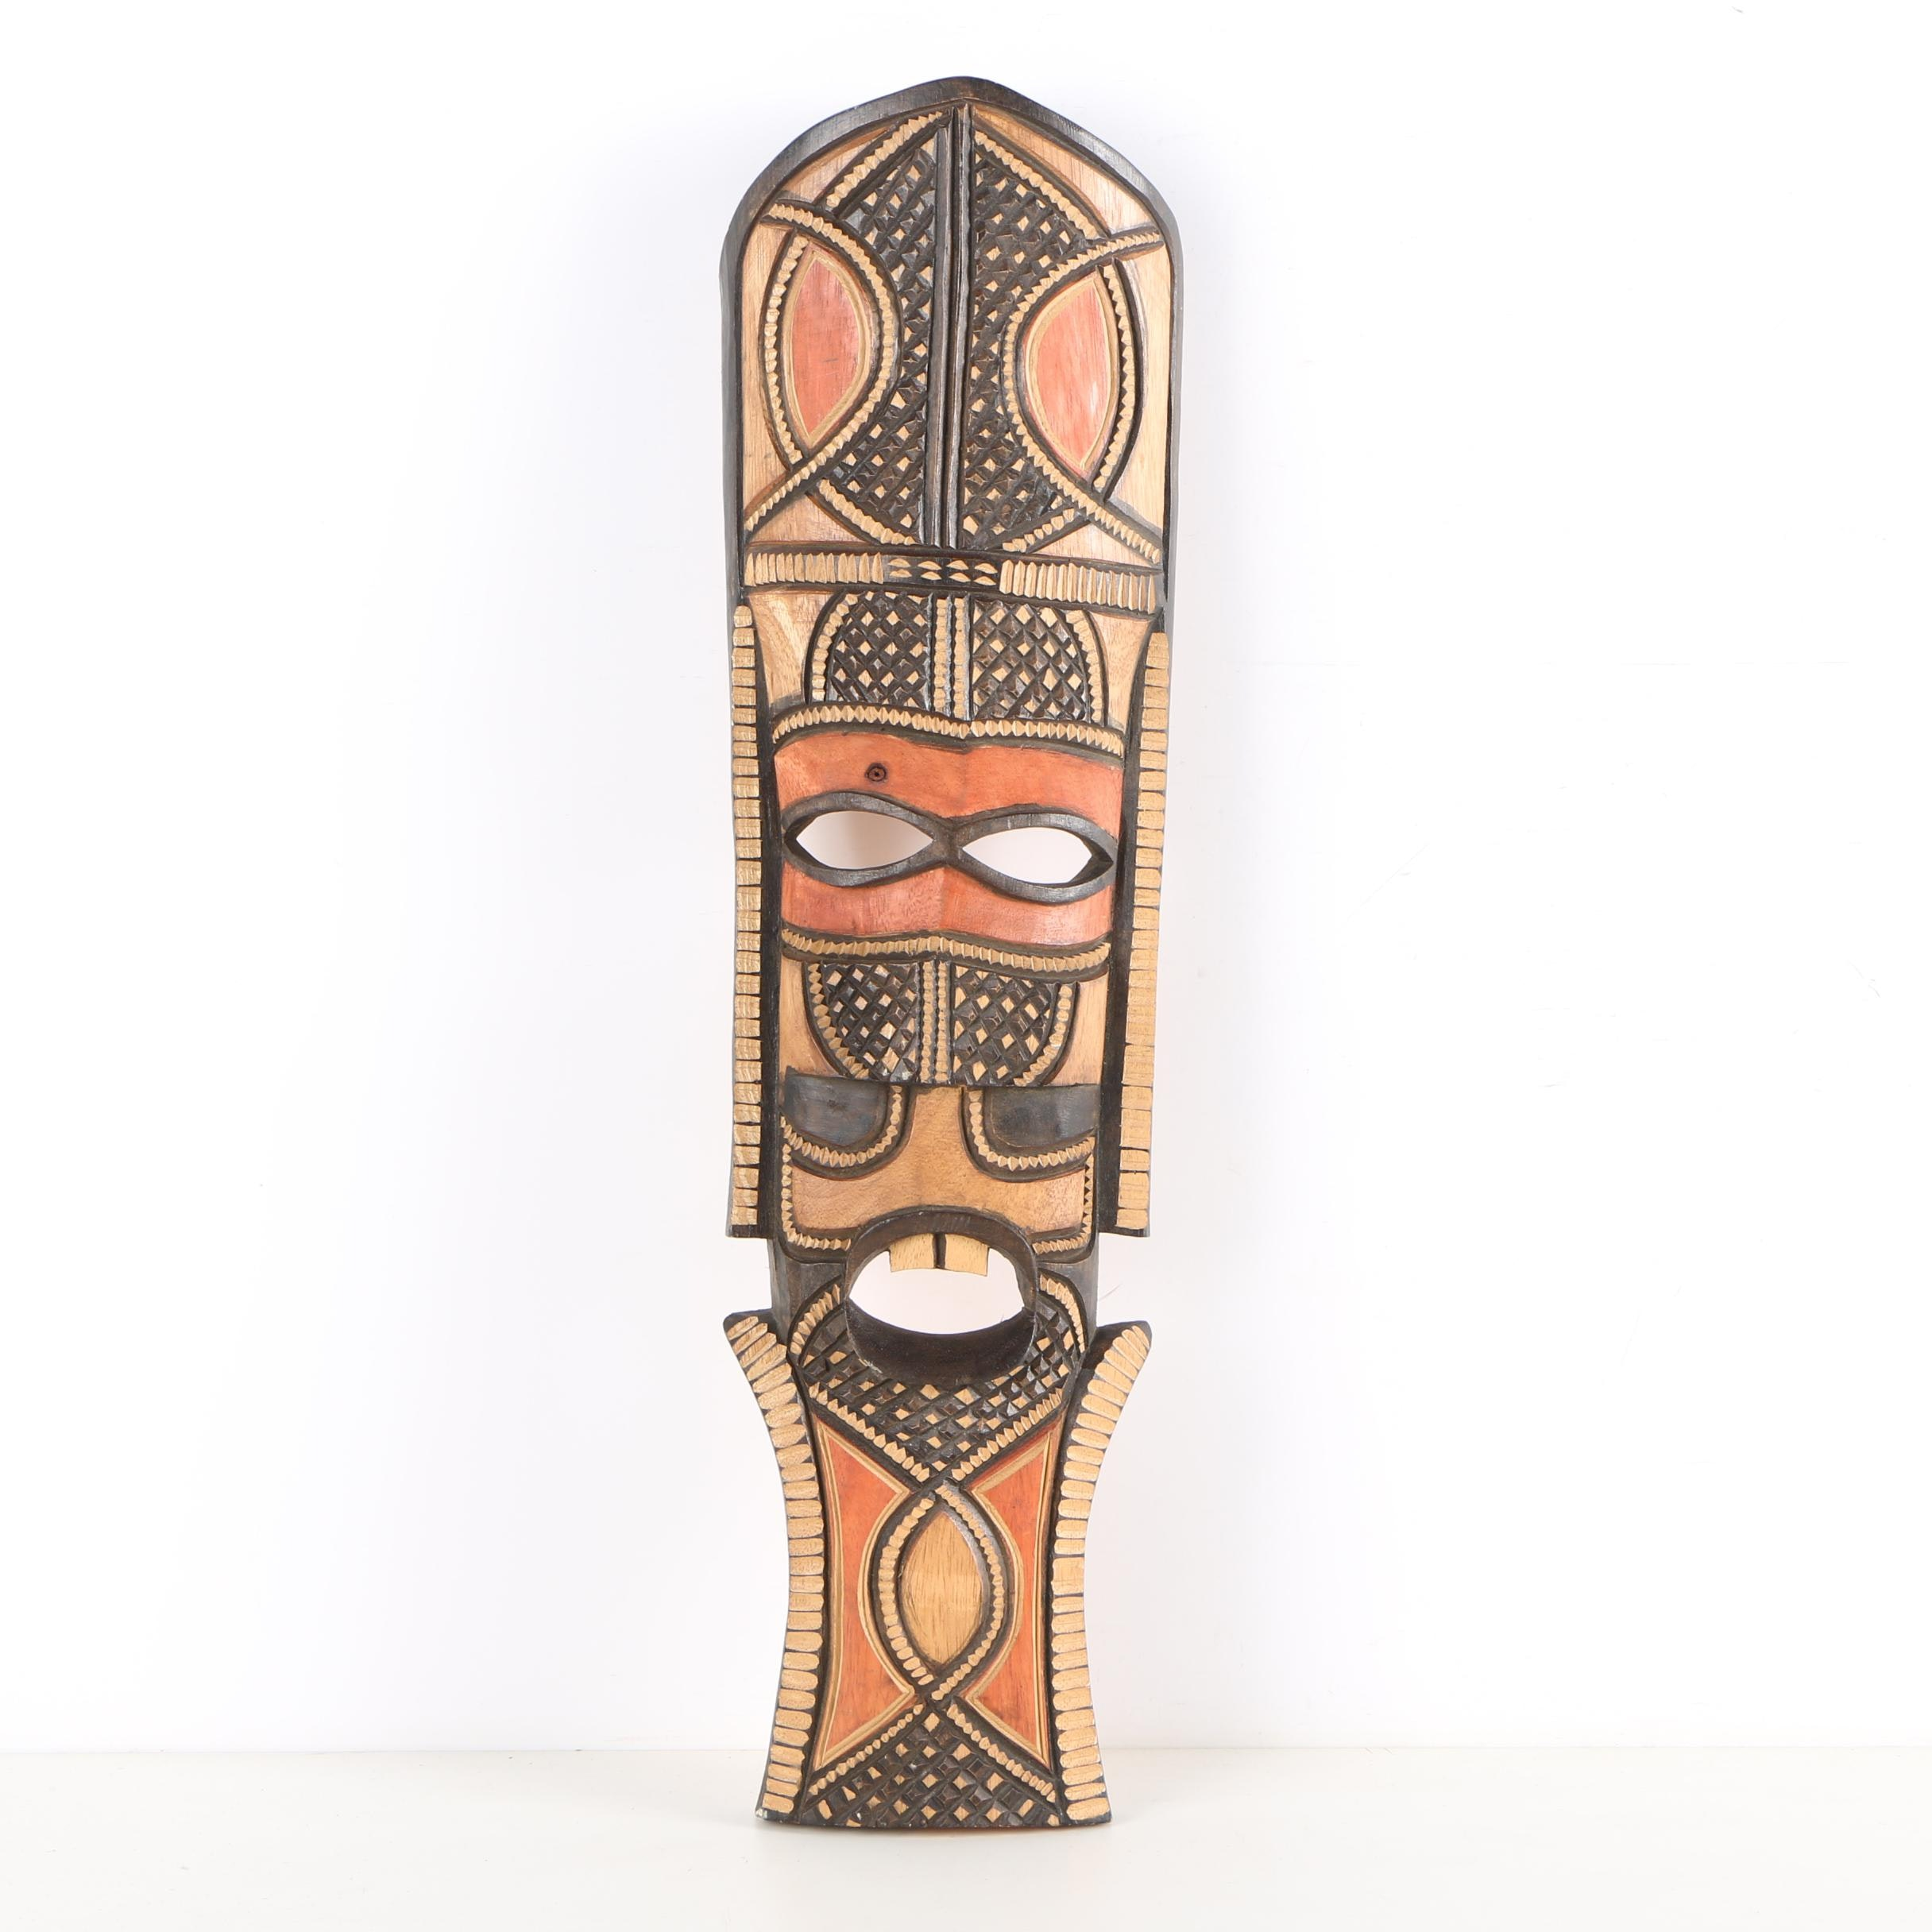 Kenyan-Style Carved Wooden Mask